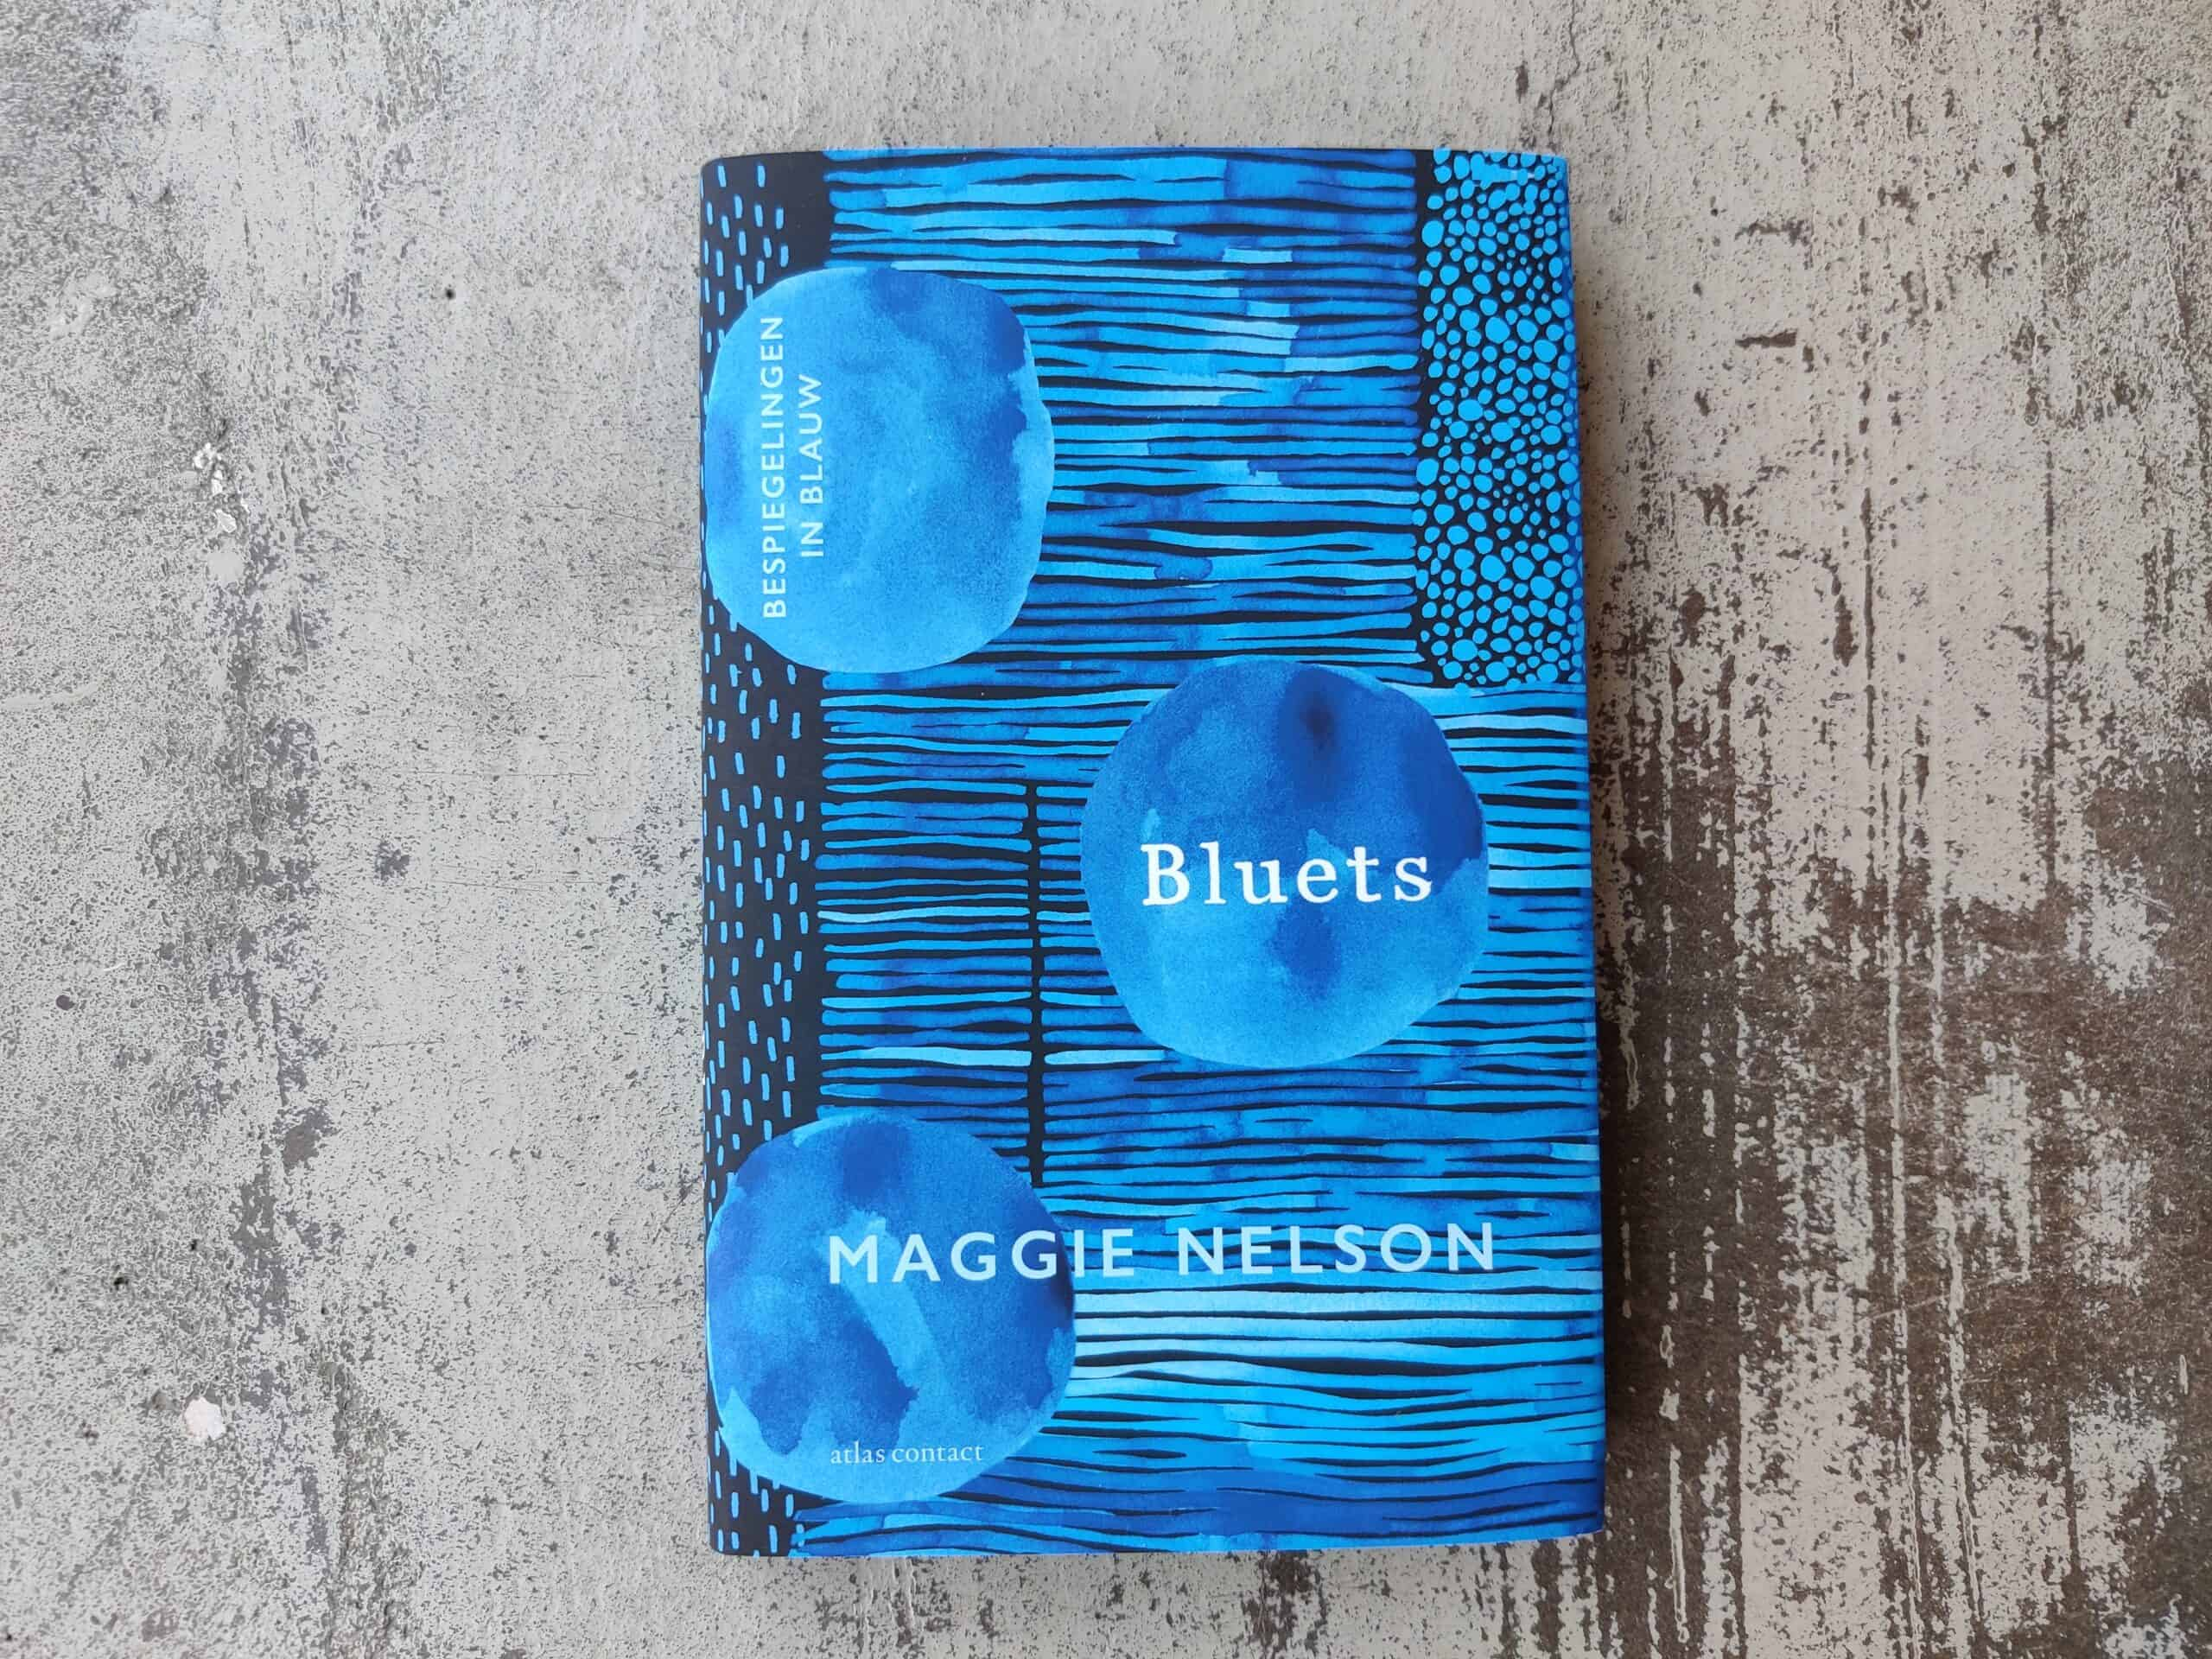 Maggie Nelson - Bluets